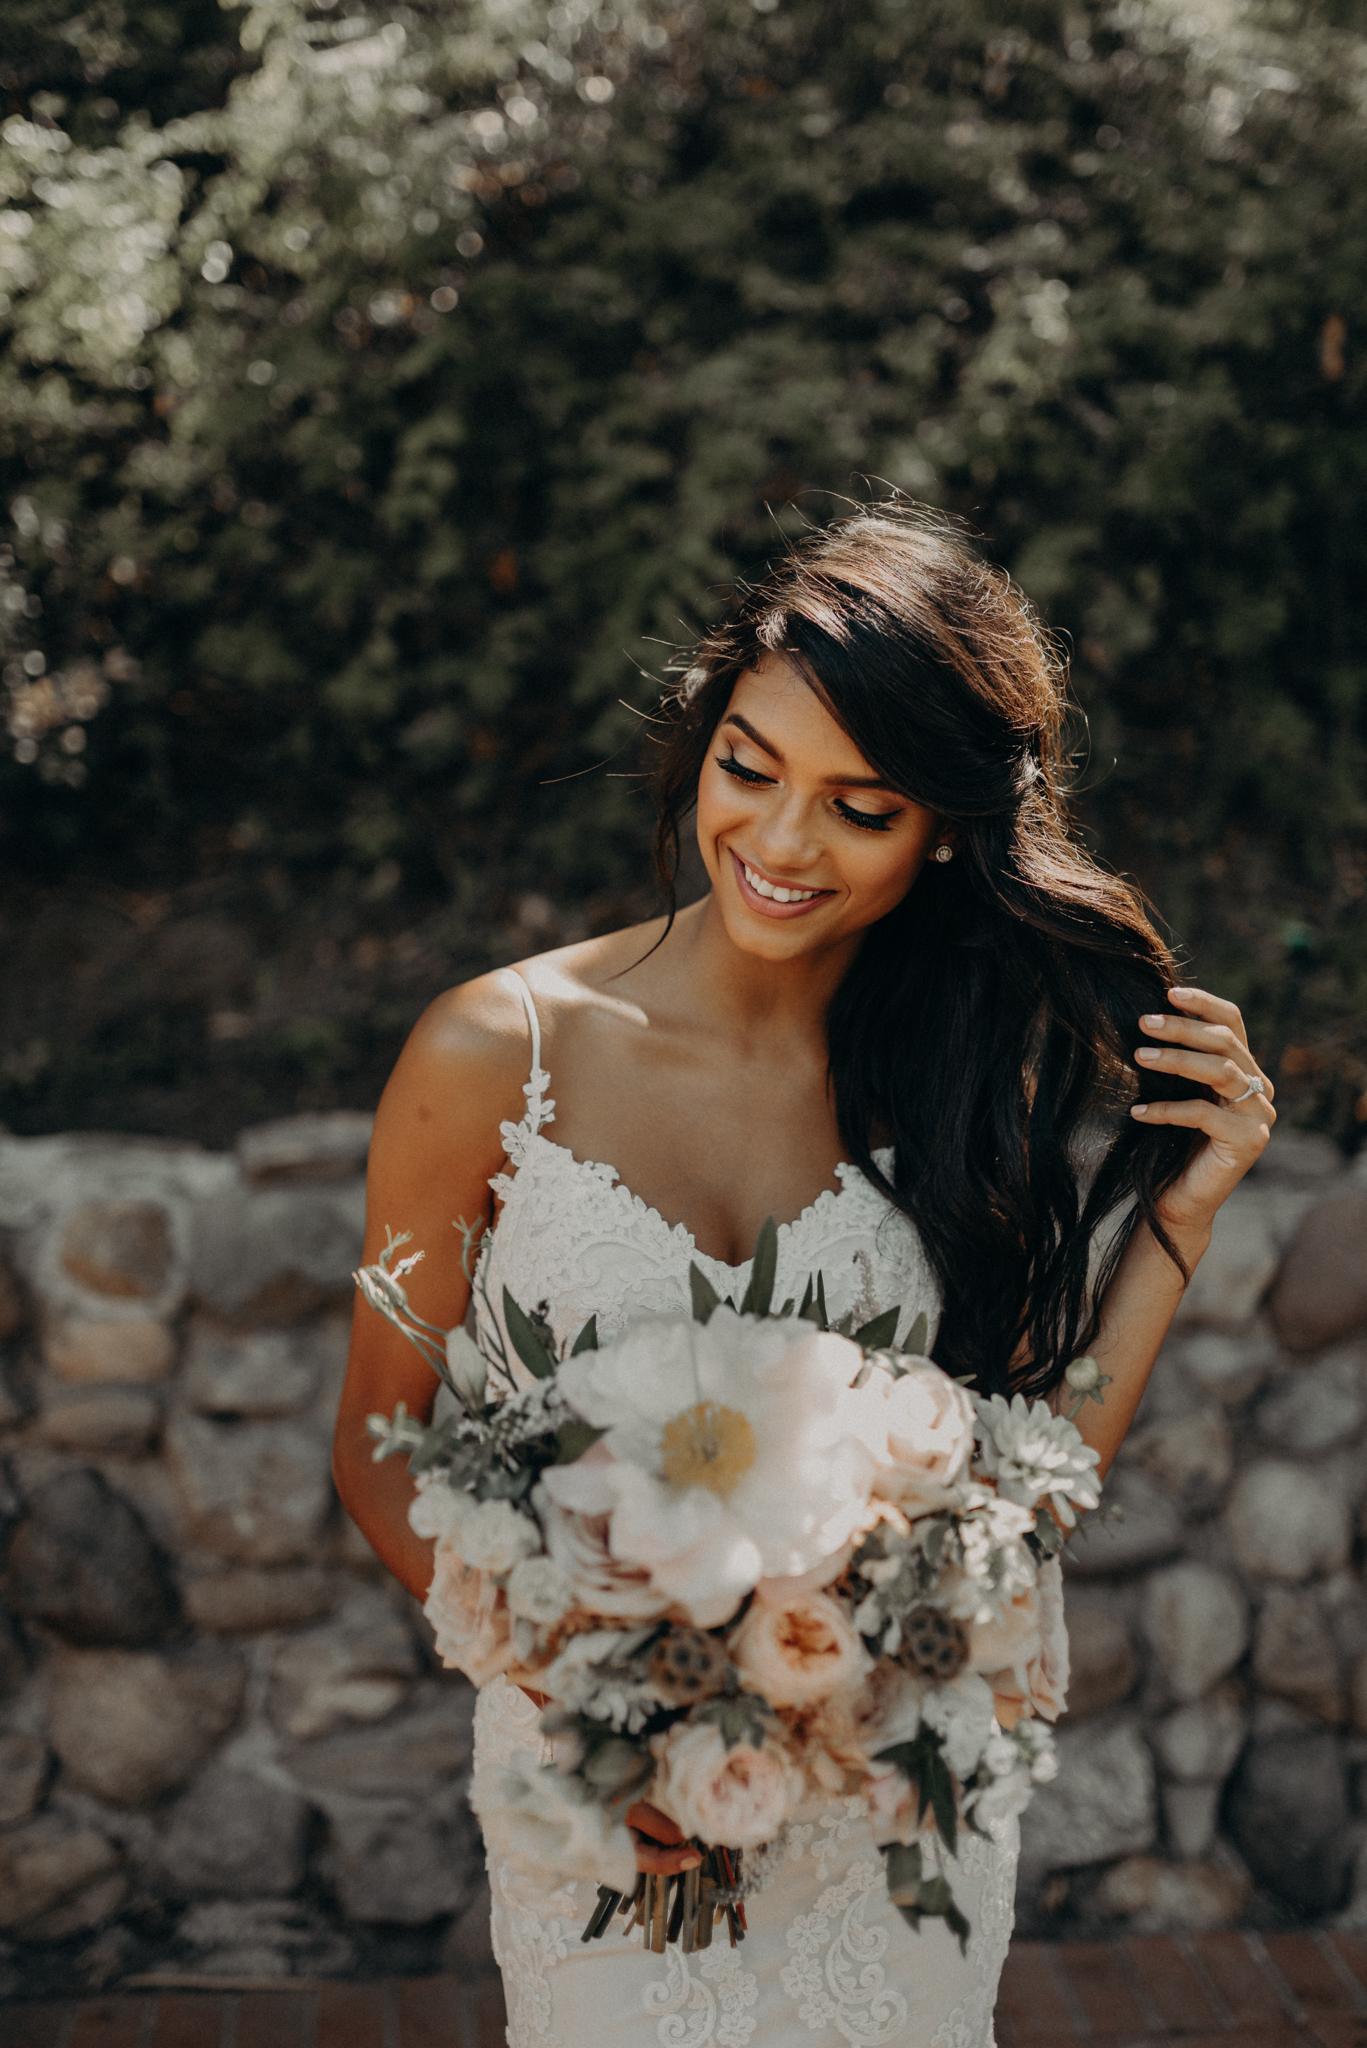 Isaiah + Taylor Photography - Rancho Las Lomas Wedding, Los Angeles Wedding Photographer-029.jpg